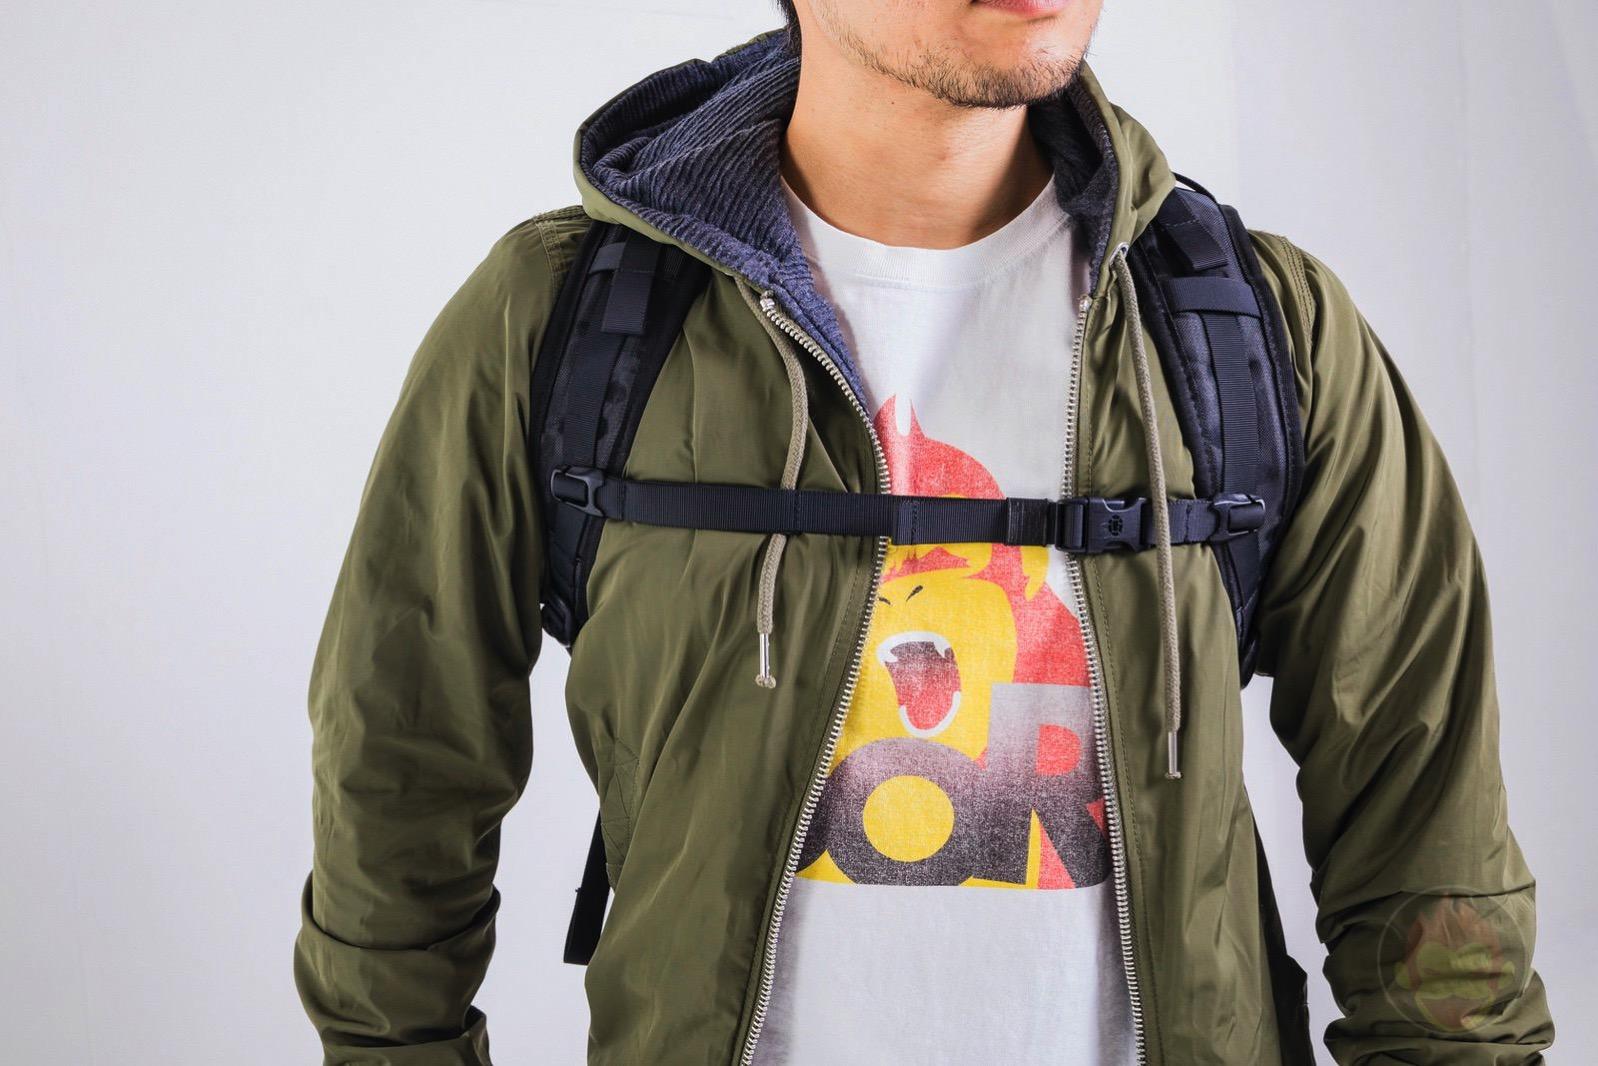 Tortuga-Setout-Backpack-35liter-review-49.jpg